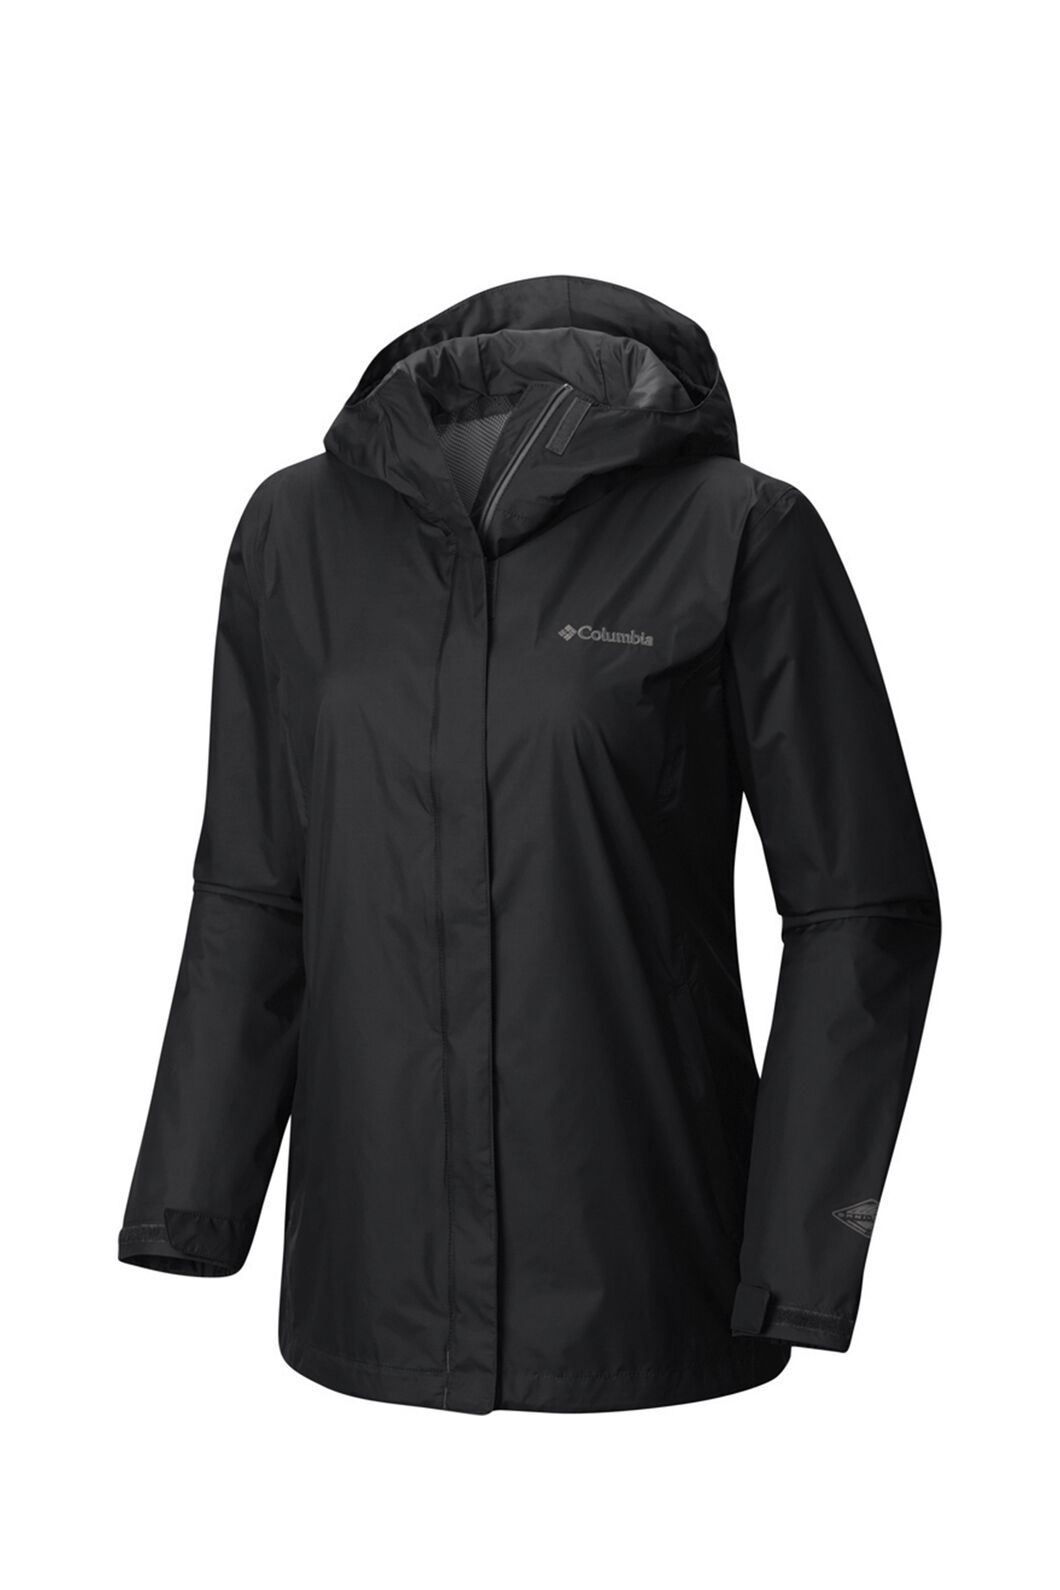 Columbia Women's Arcadia II Jacket, Black, hi-res